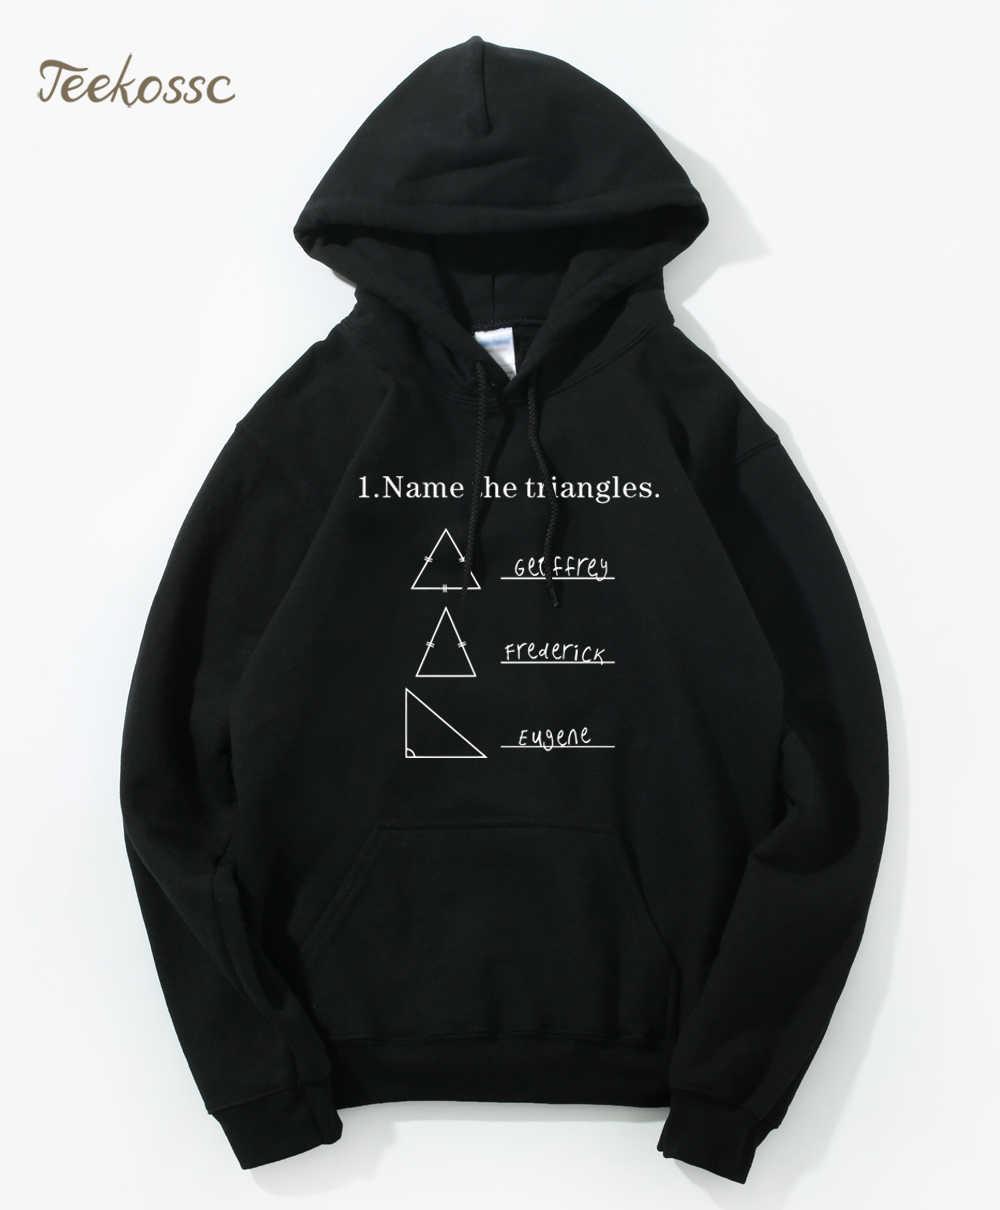 Nama Segitiga Lucu Hoodie Pria Sarkasme Baru I LOVE Math Hoody Geometri Hooded Sweatshirt Pria Fleece Hangat Guru Hadiah